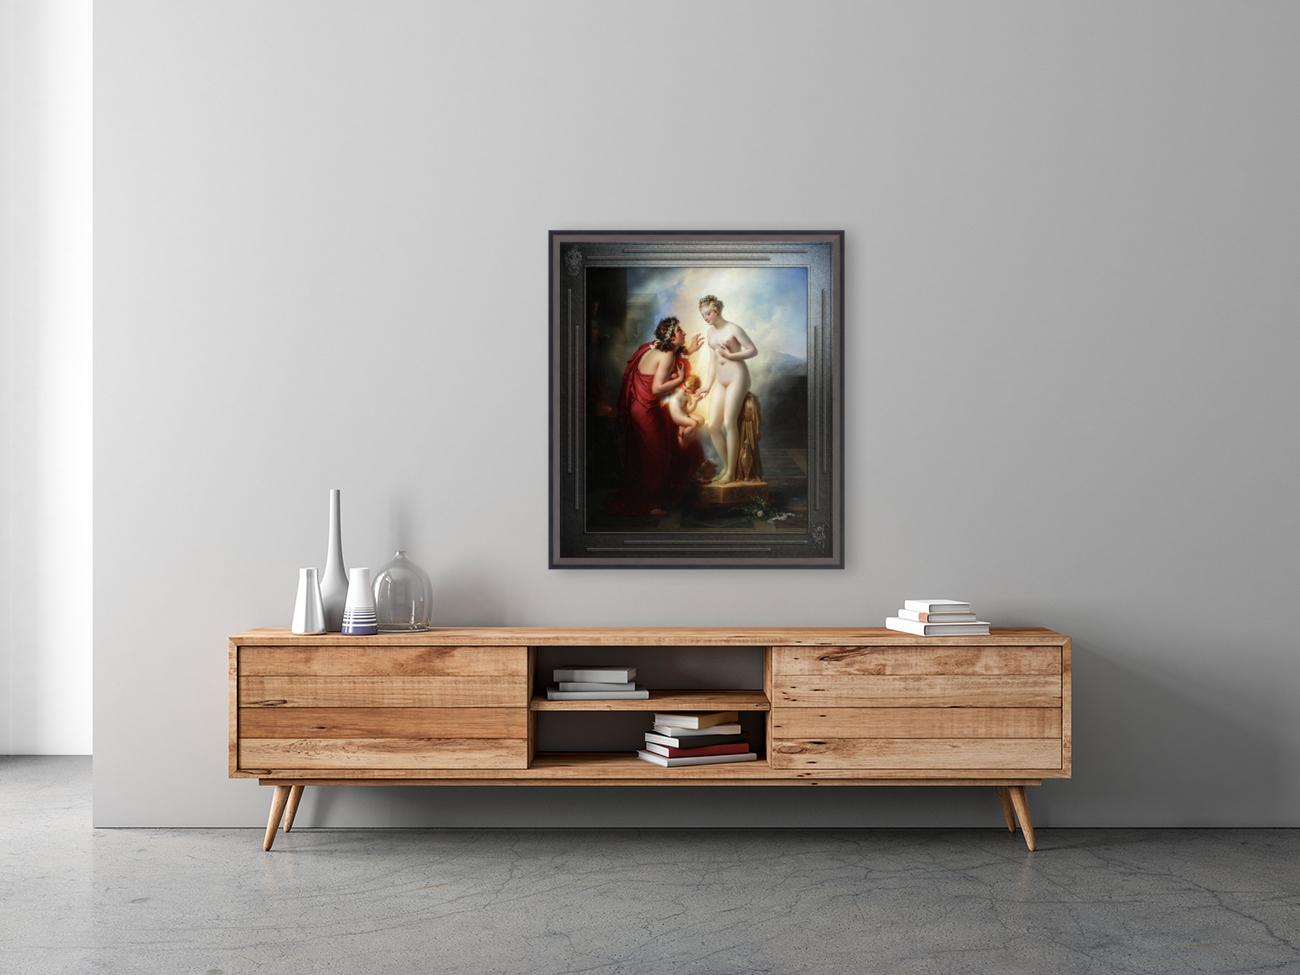 Pygmalion et Galatee byAnne-Louis Girodet-Trioson Classical Fine Art Xzendor7 Old Masters Reproductions  Art